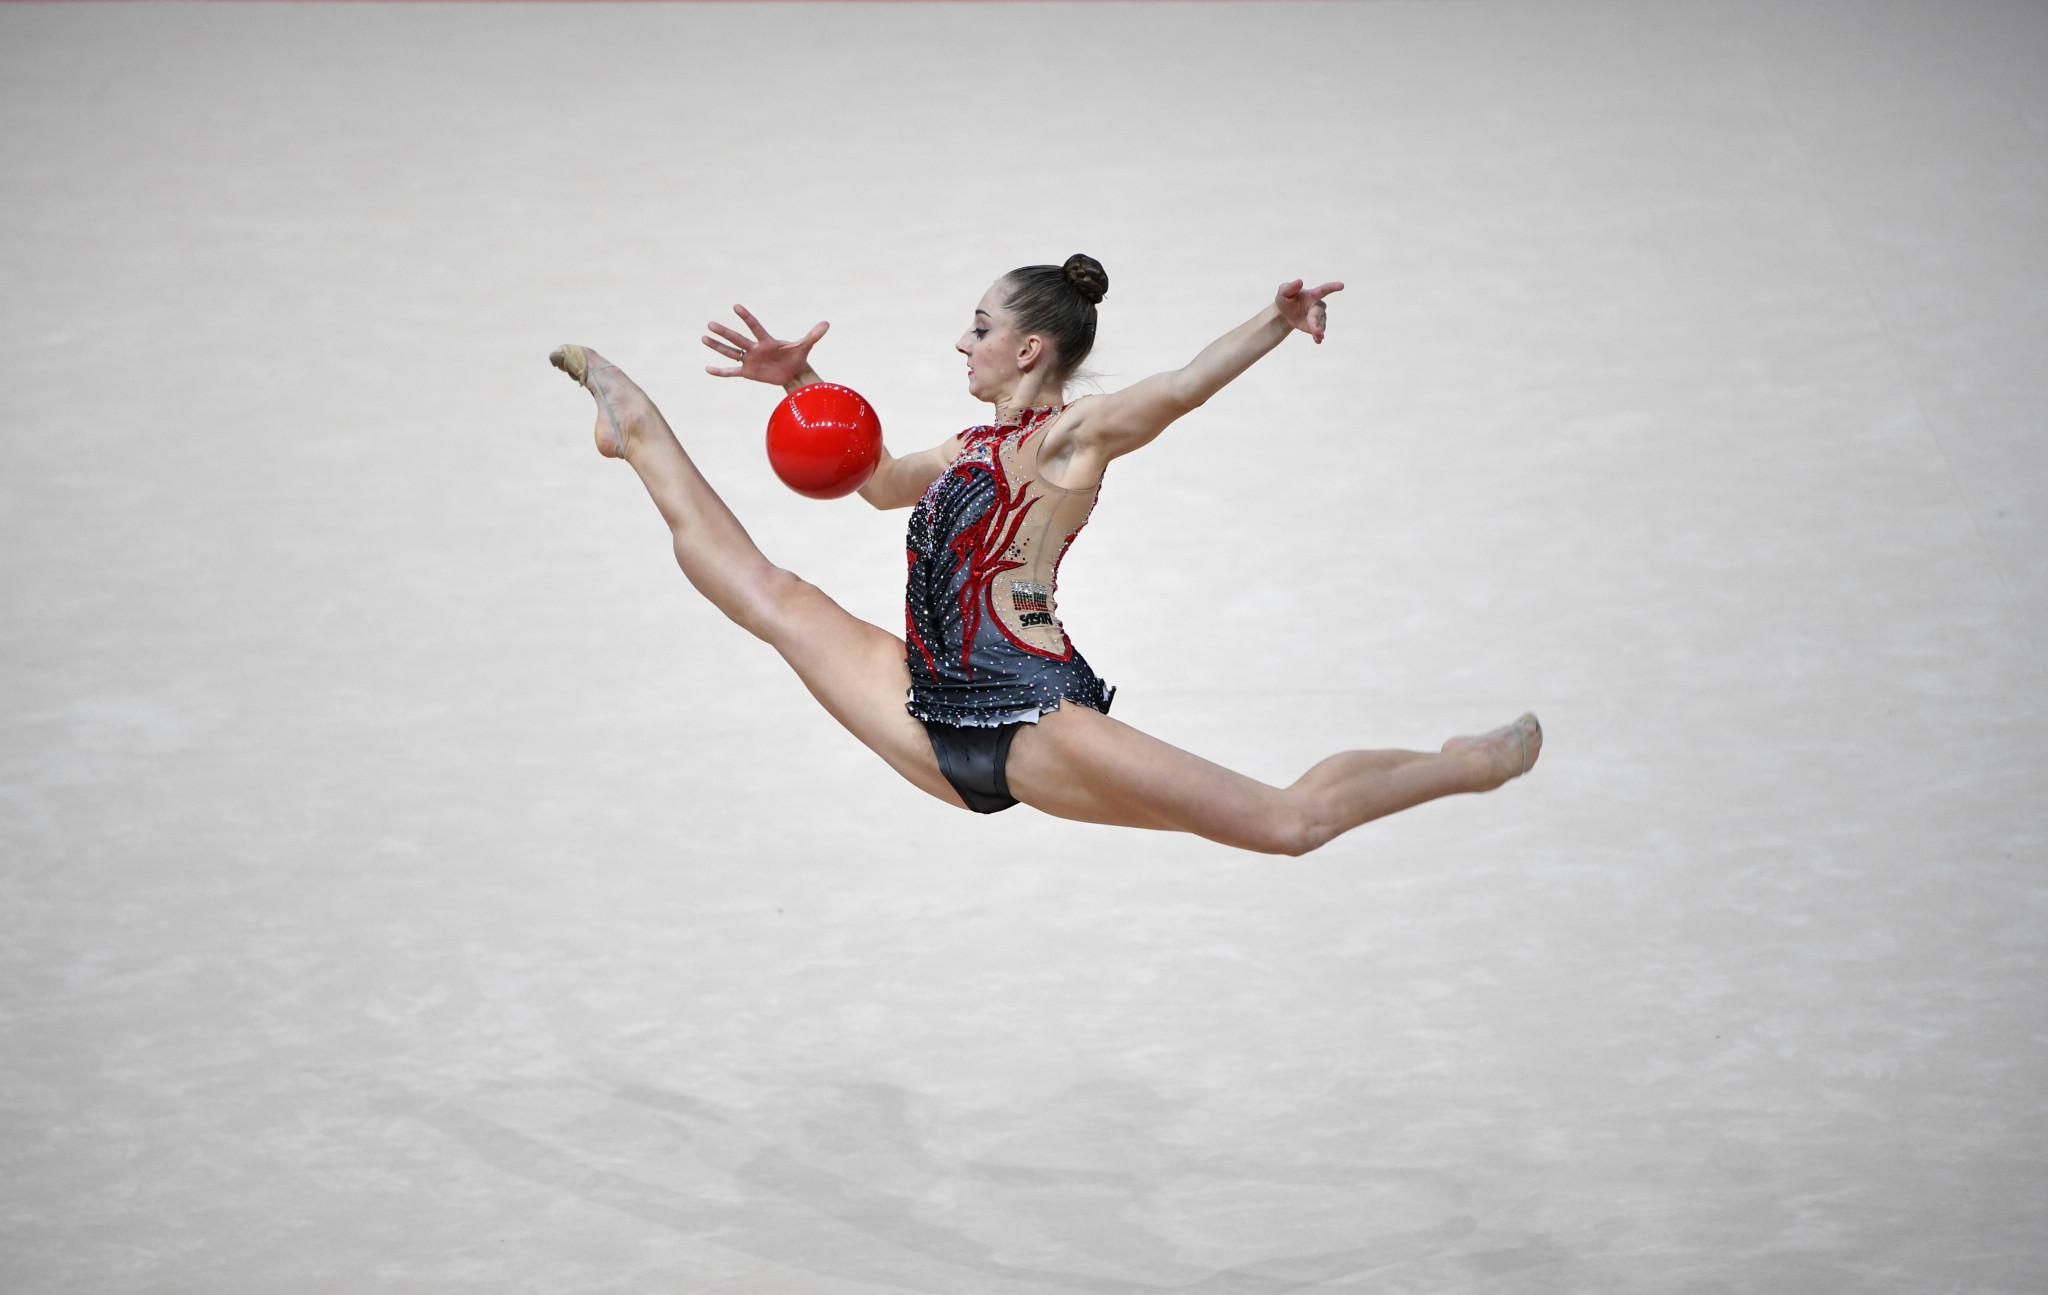 Boryana Kaleyn led ball qualification in Sofia ©Getty Images